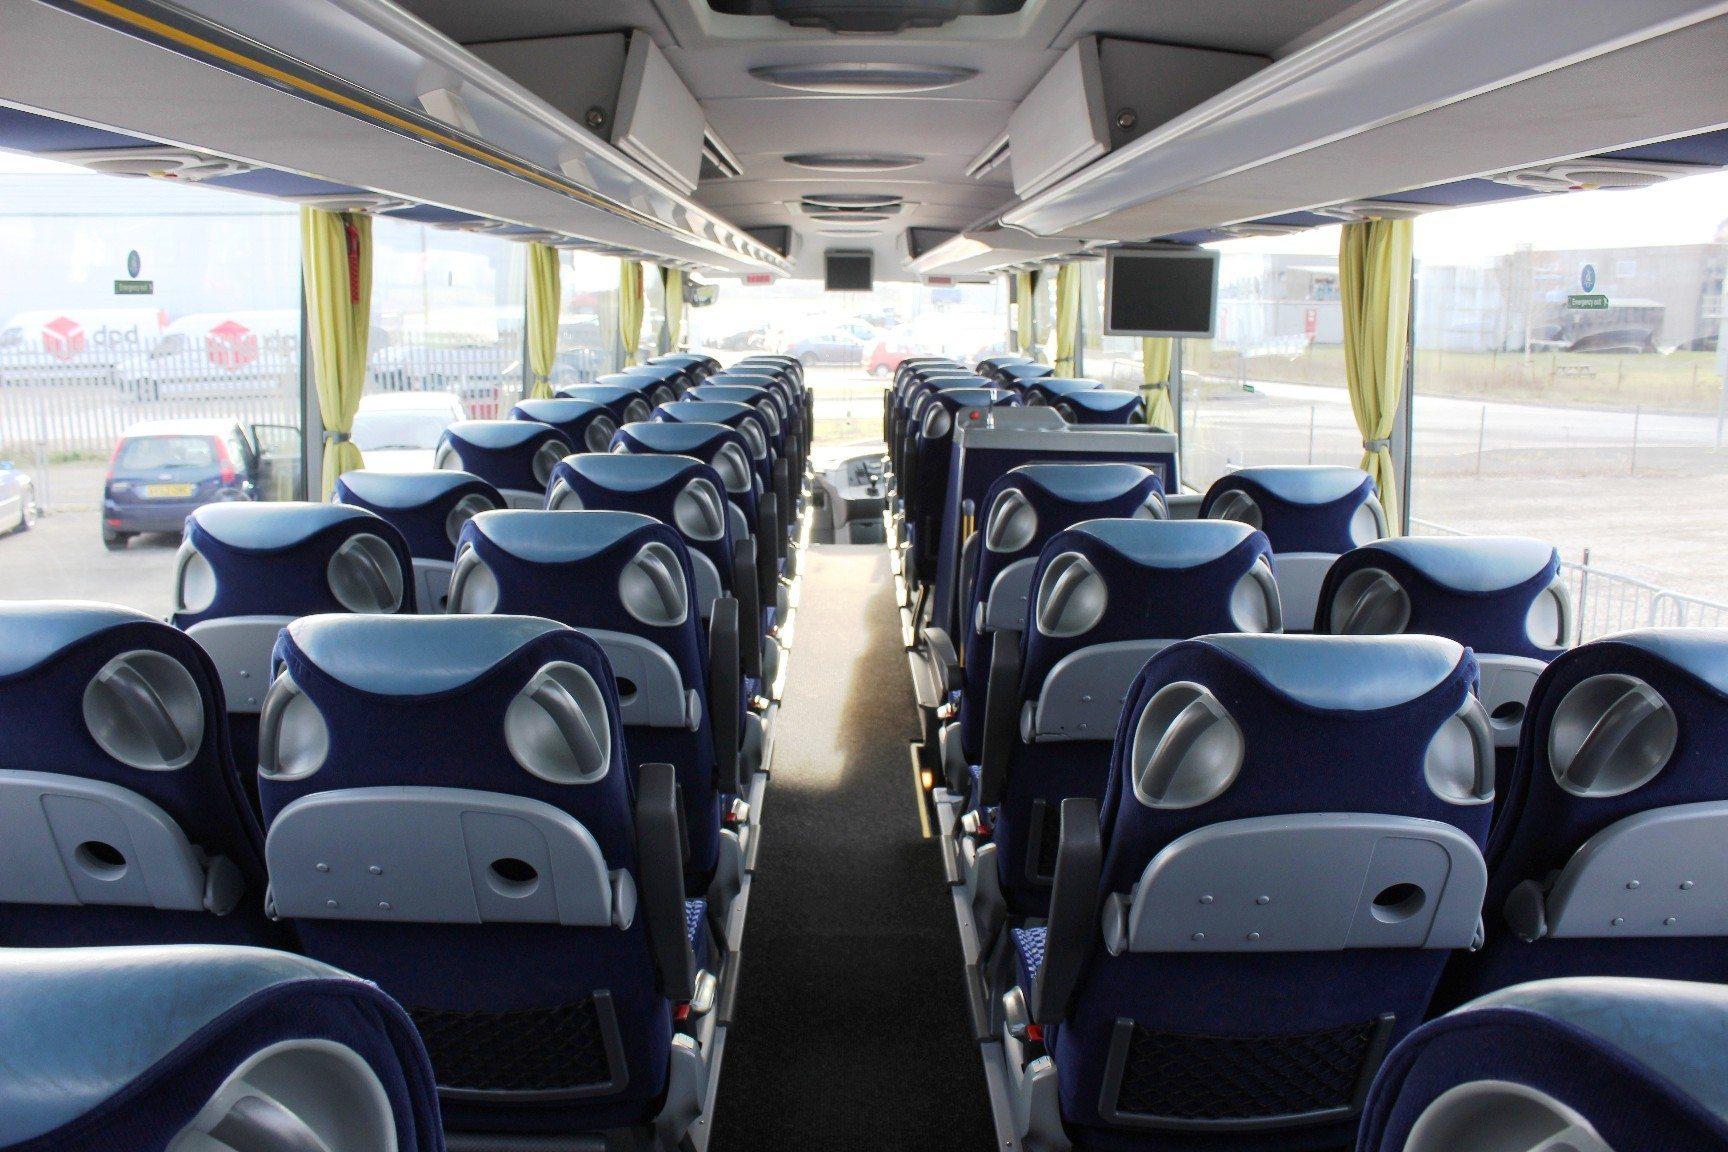 09 Mercedes Benz Tourismo 49 Seats Hills Coaches